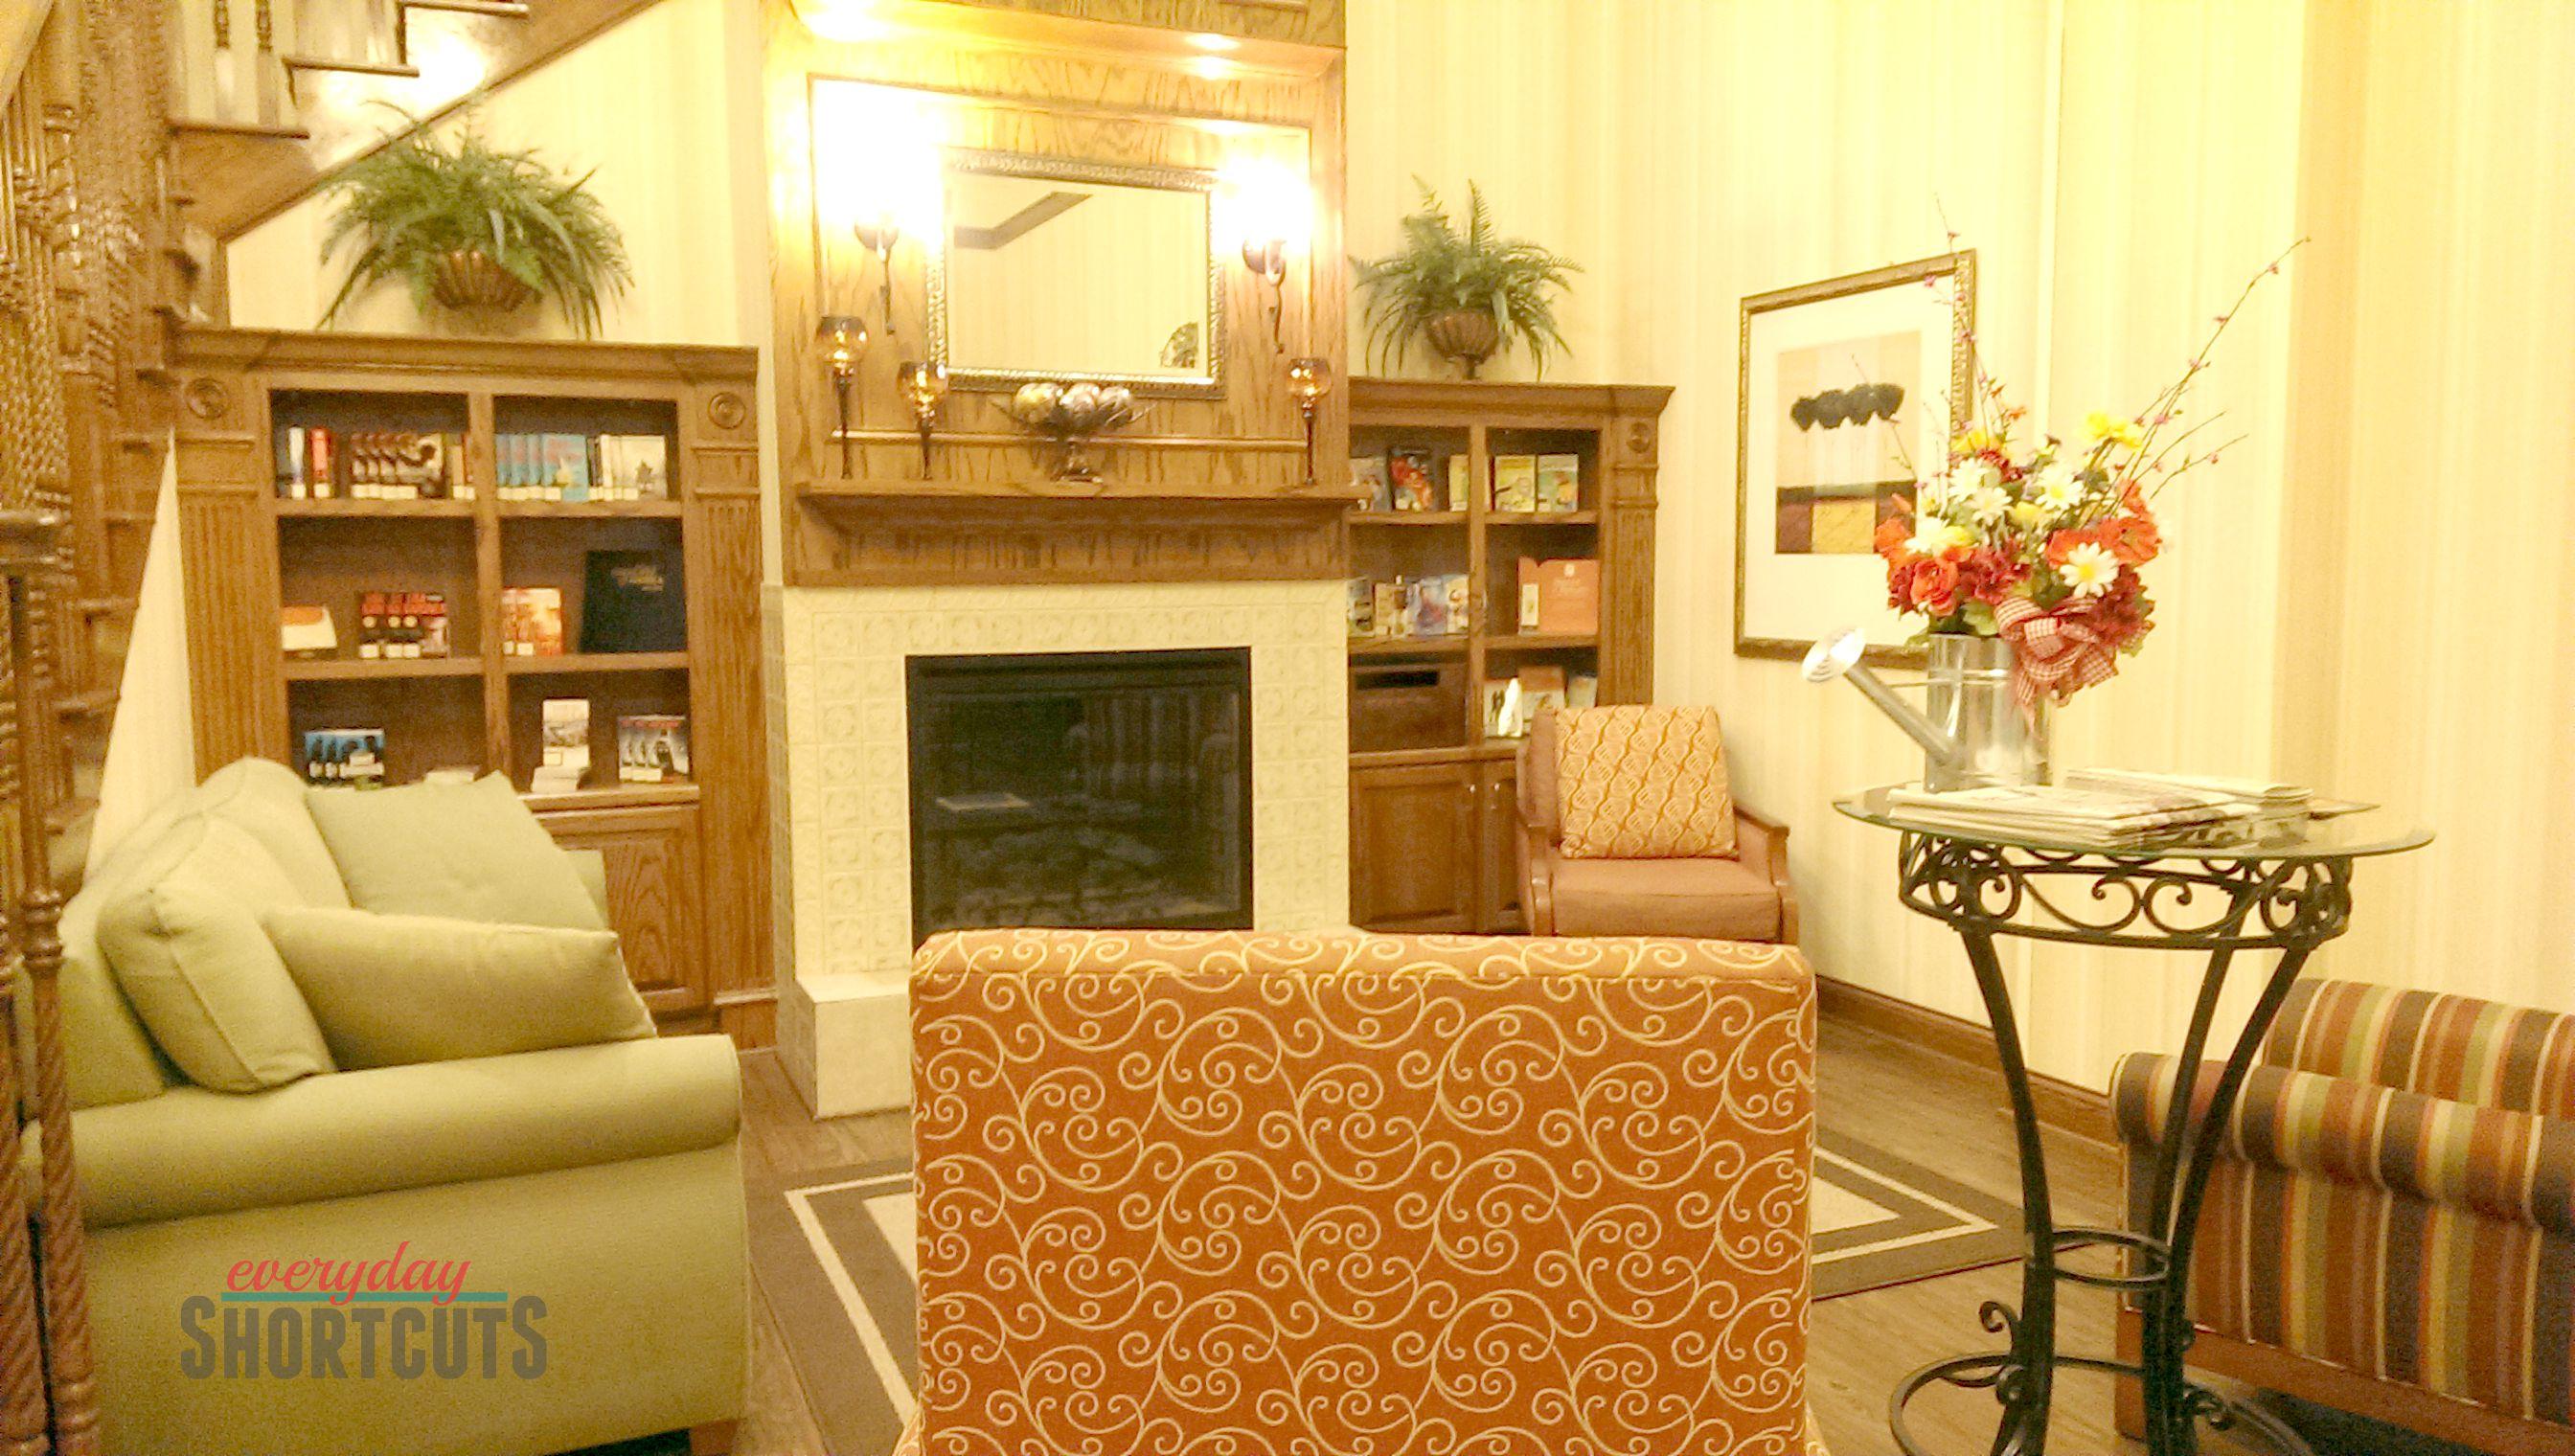 country-inn-suites-lobby